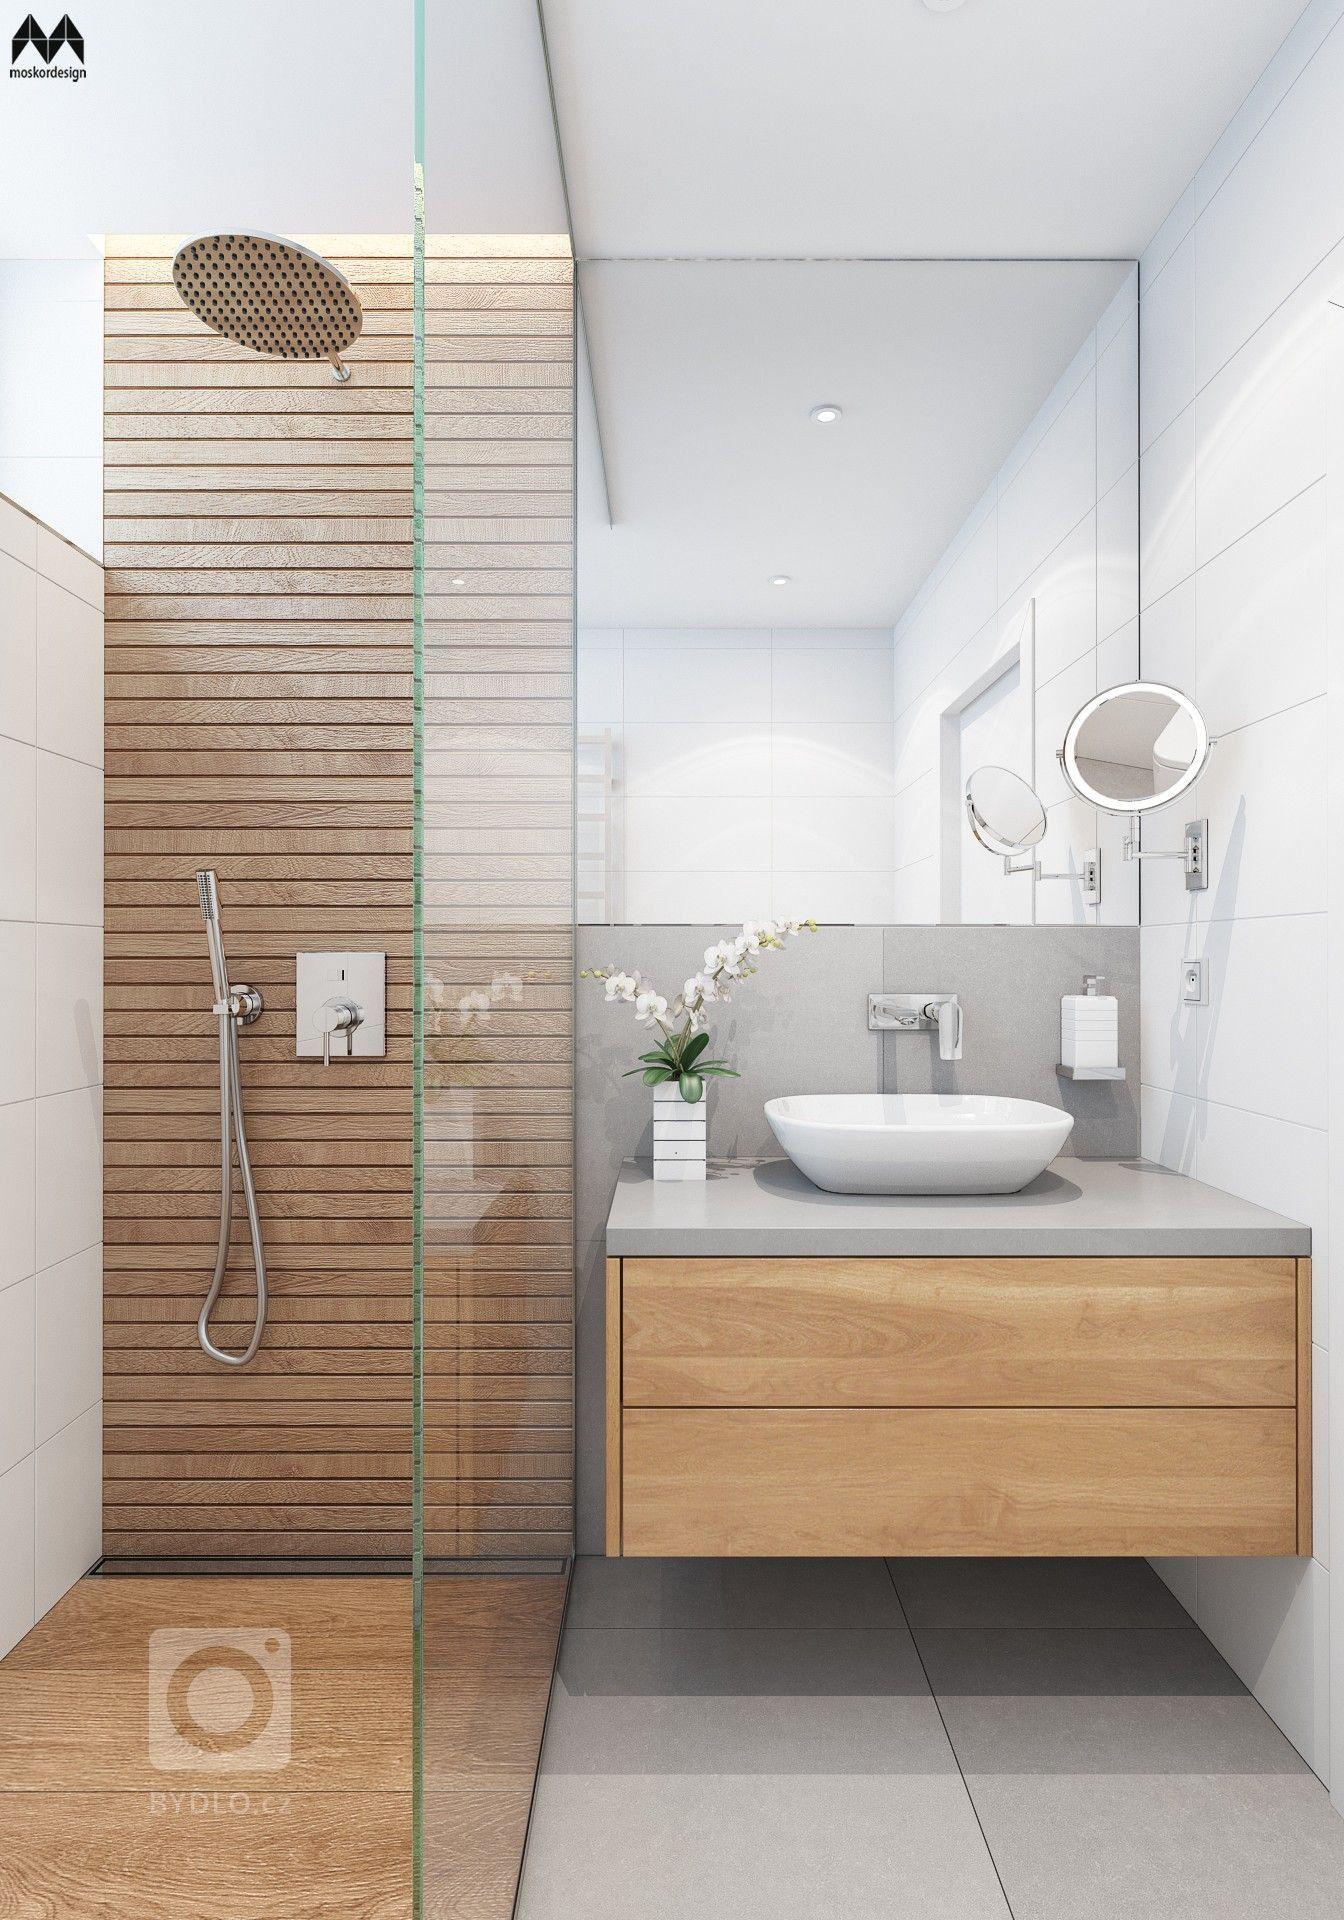 Pin By Sofia Pavlidis On Bathrooms Small Bathroom Makeover Small Bathroom Remodel Bathroom Layout [ 1920 x 1344 Pixel ]